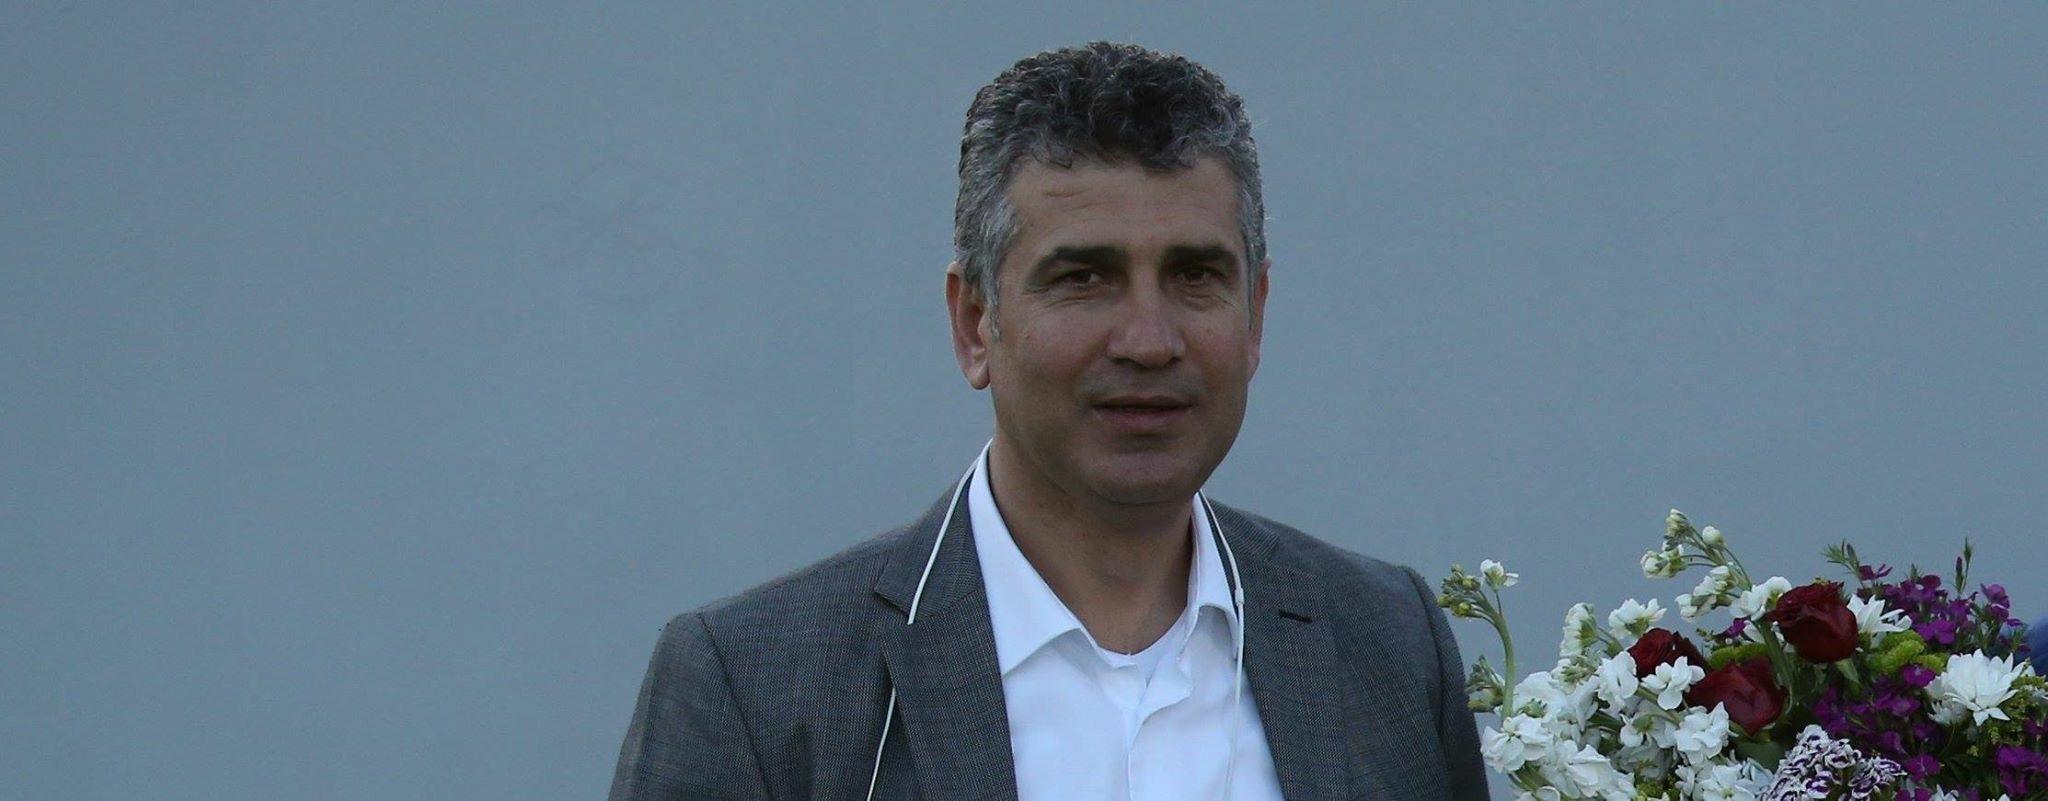 Destan yazıp Trabzonspor'dan istifa etti